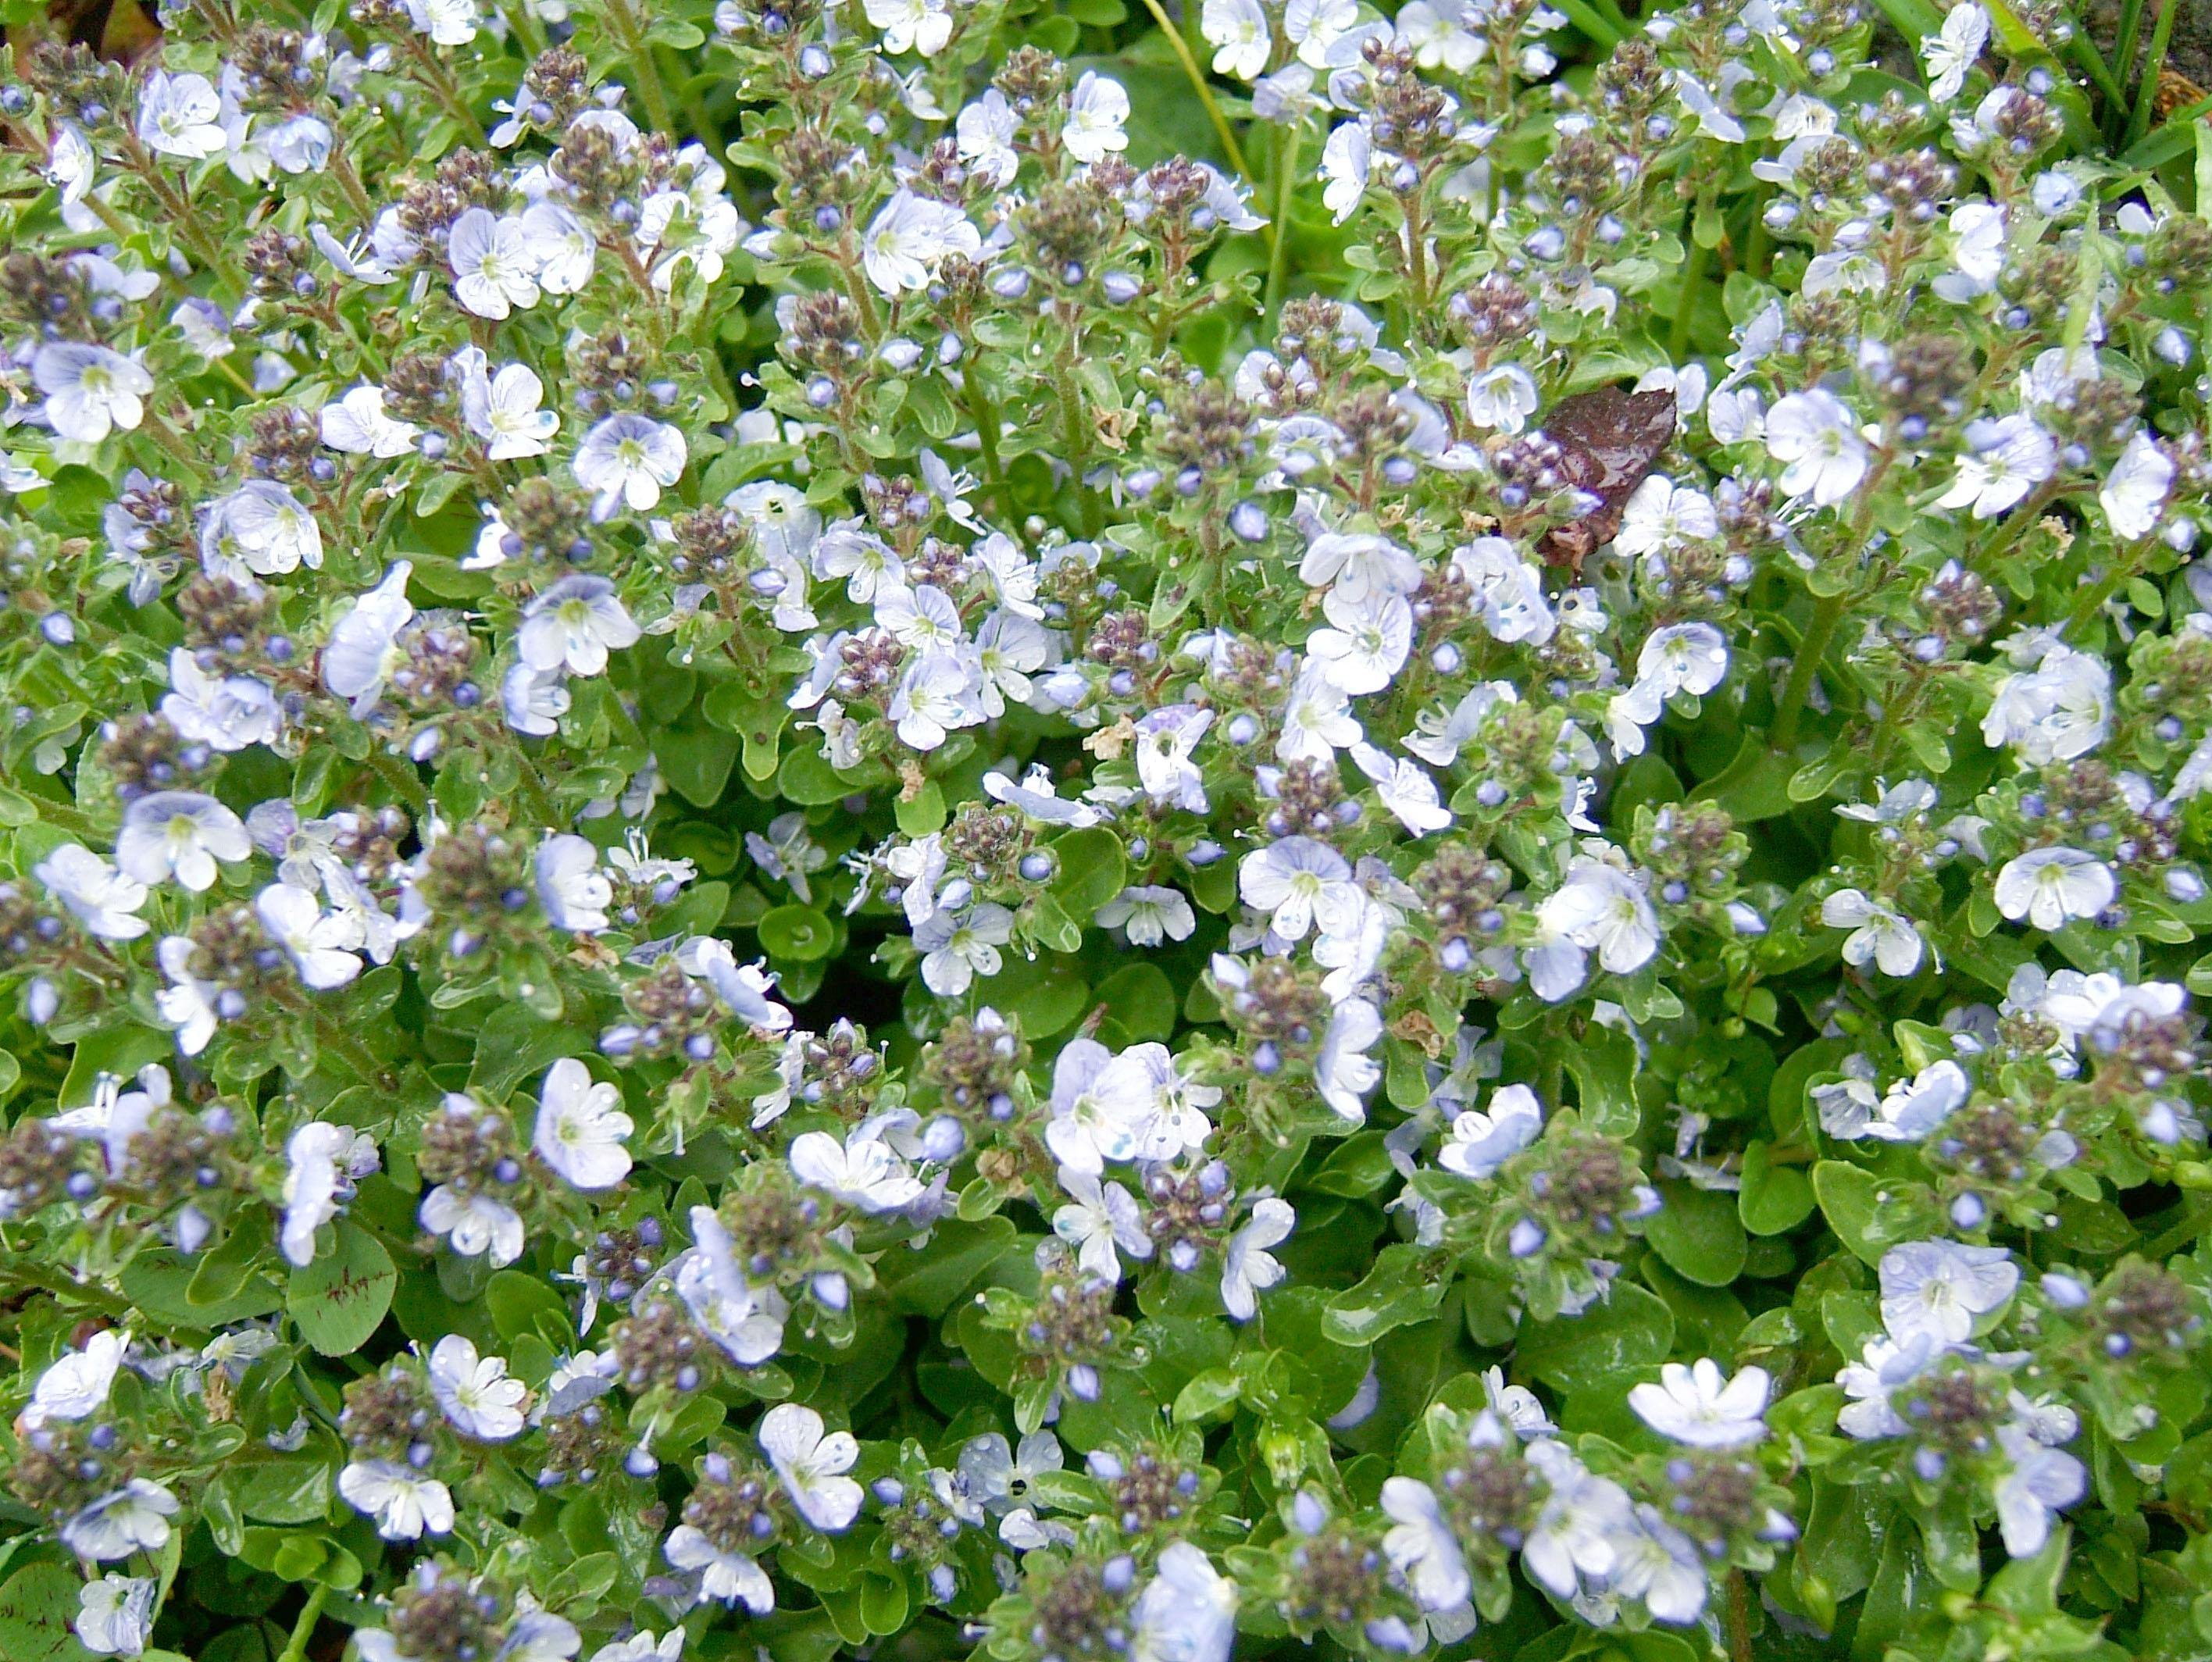 Local Wild spring flowers Srinagar Kashmir India 16